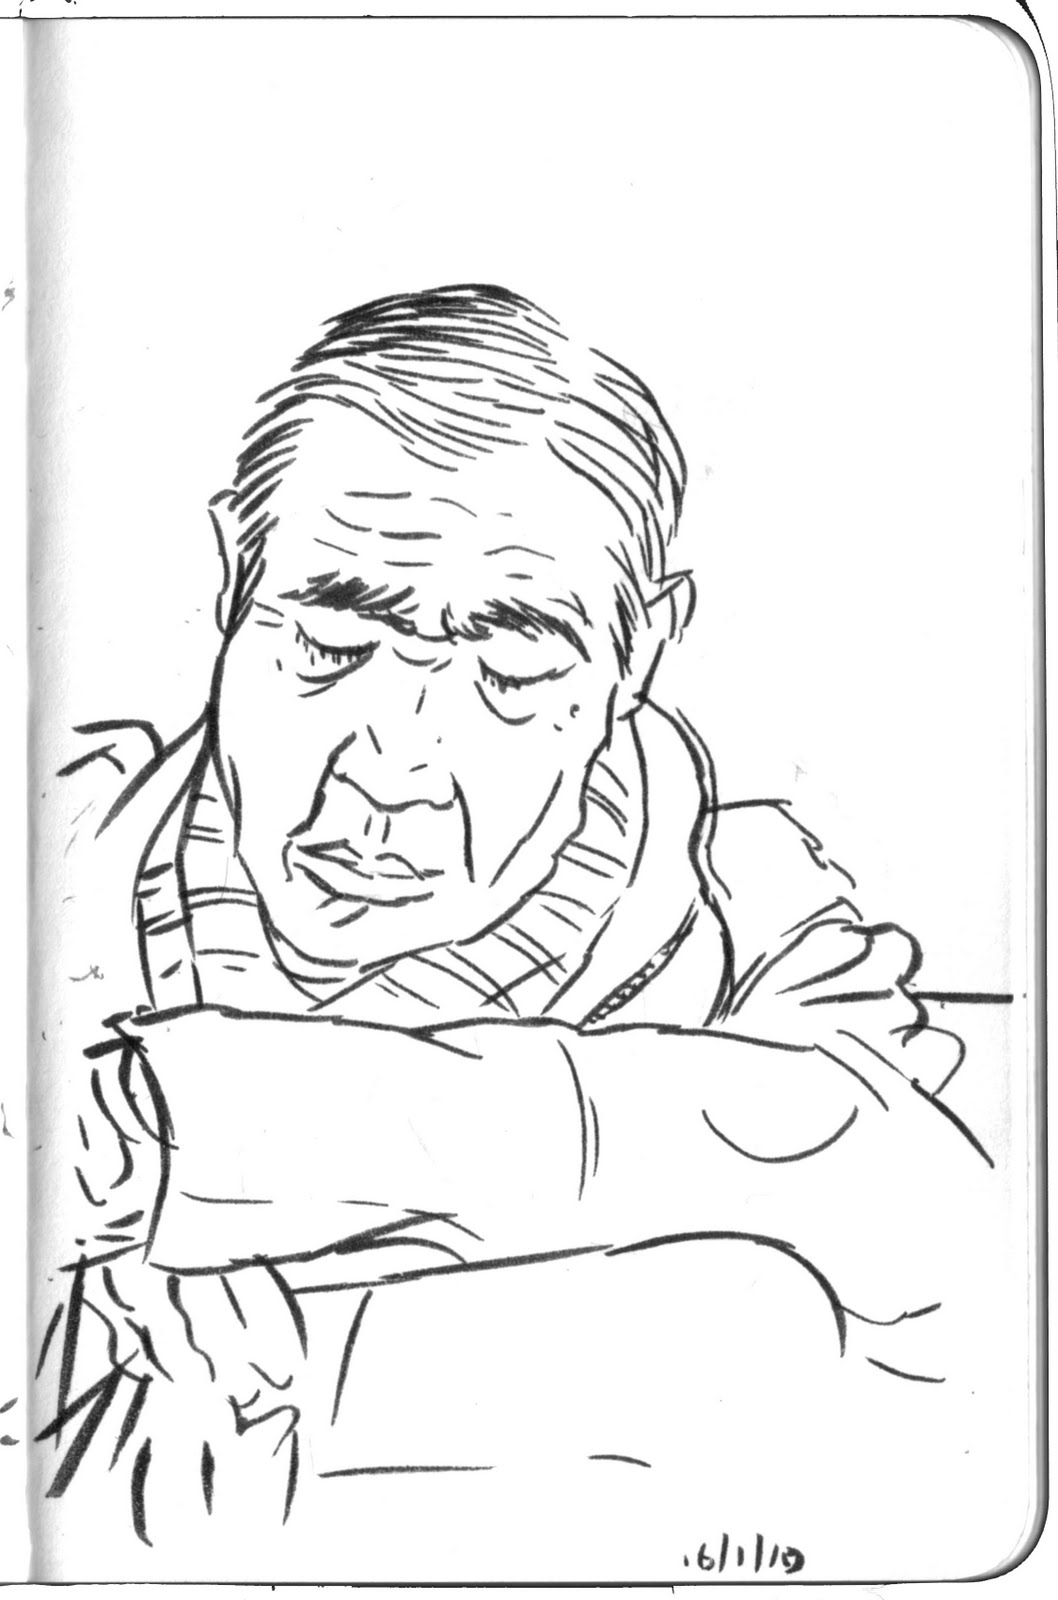 Urban Sketchbook: Sleeping Man on Train from Funabashi